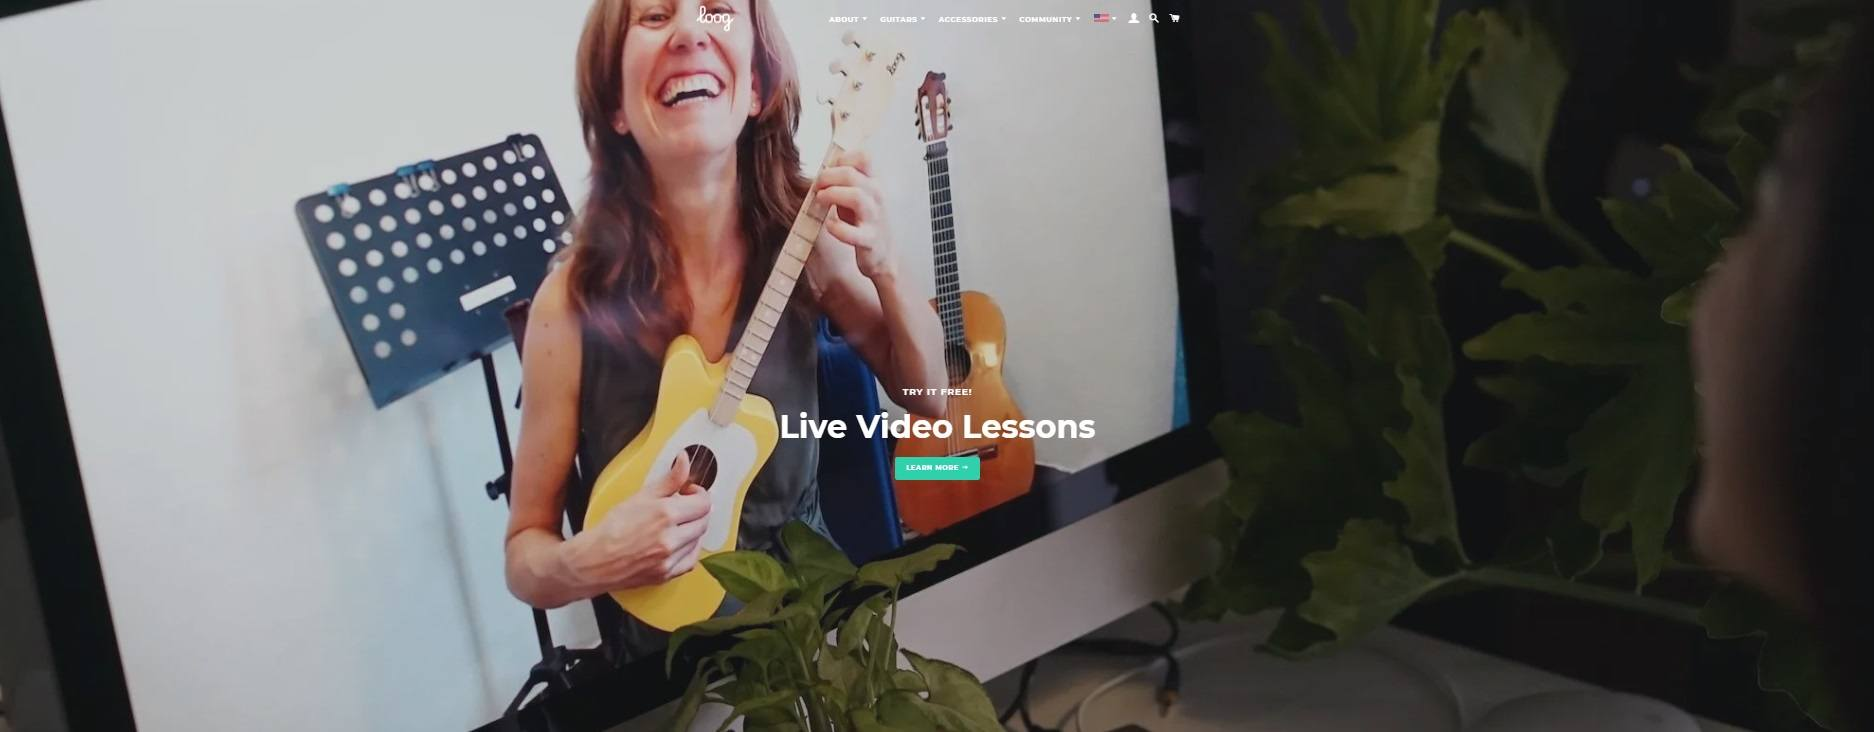 Loop Guitar - Live Video Lessons